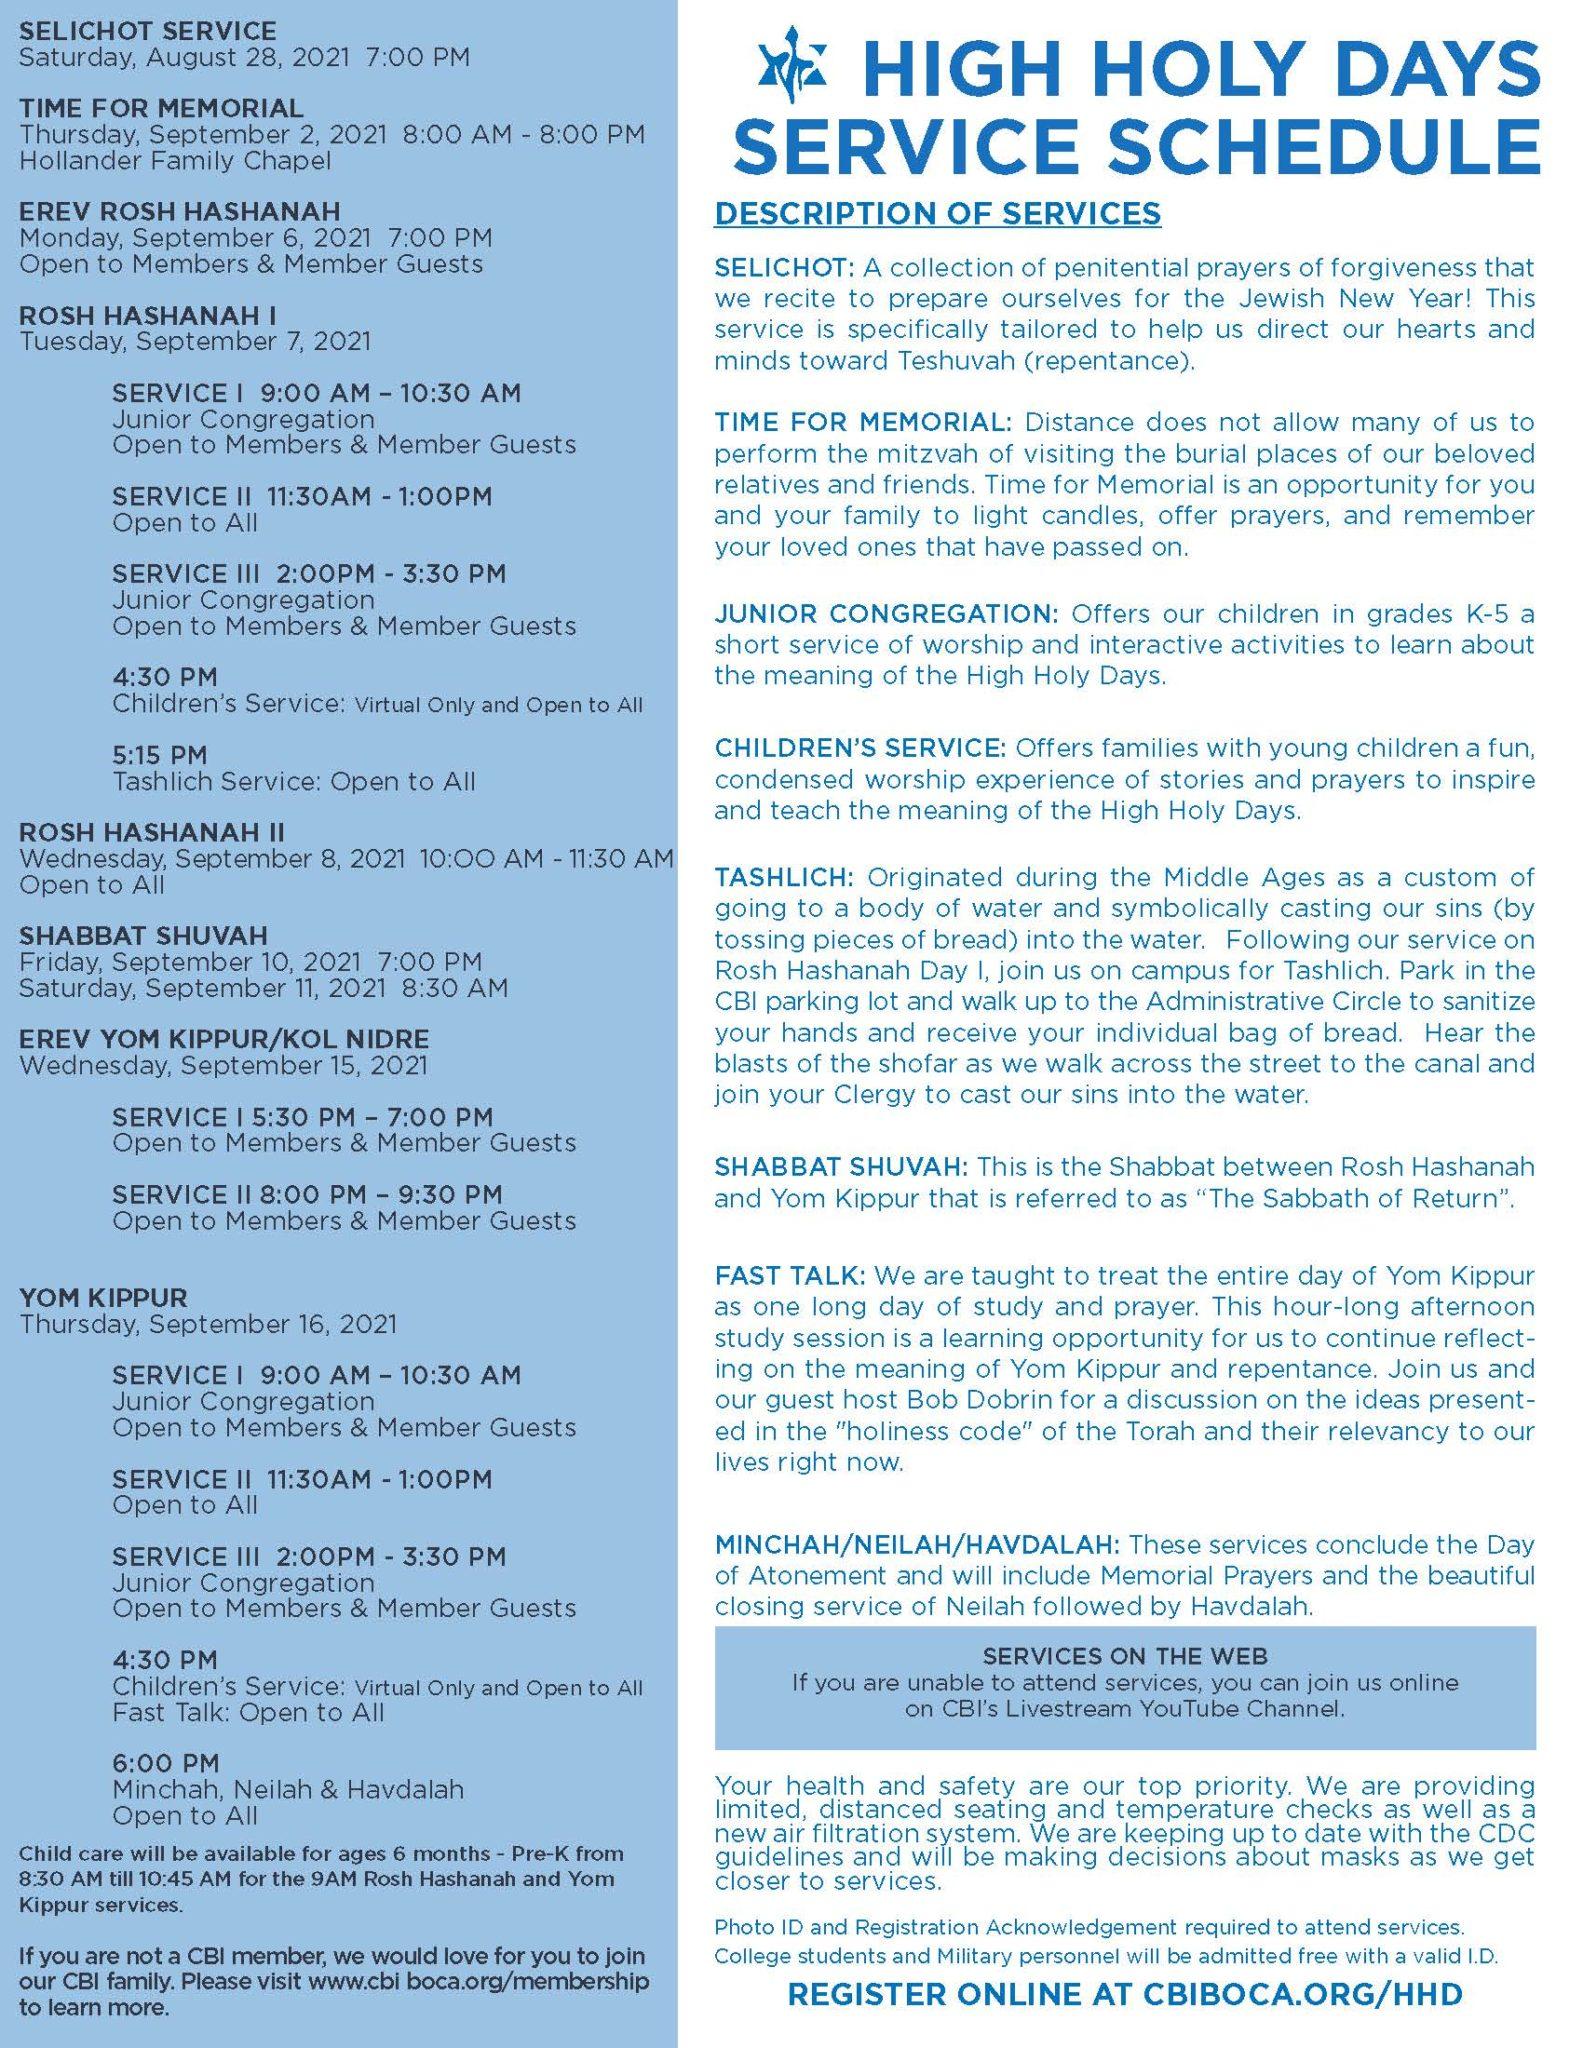 HHD5782 ServiceSchedule SinglePage